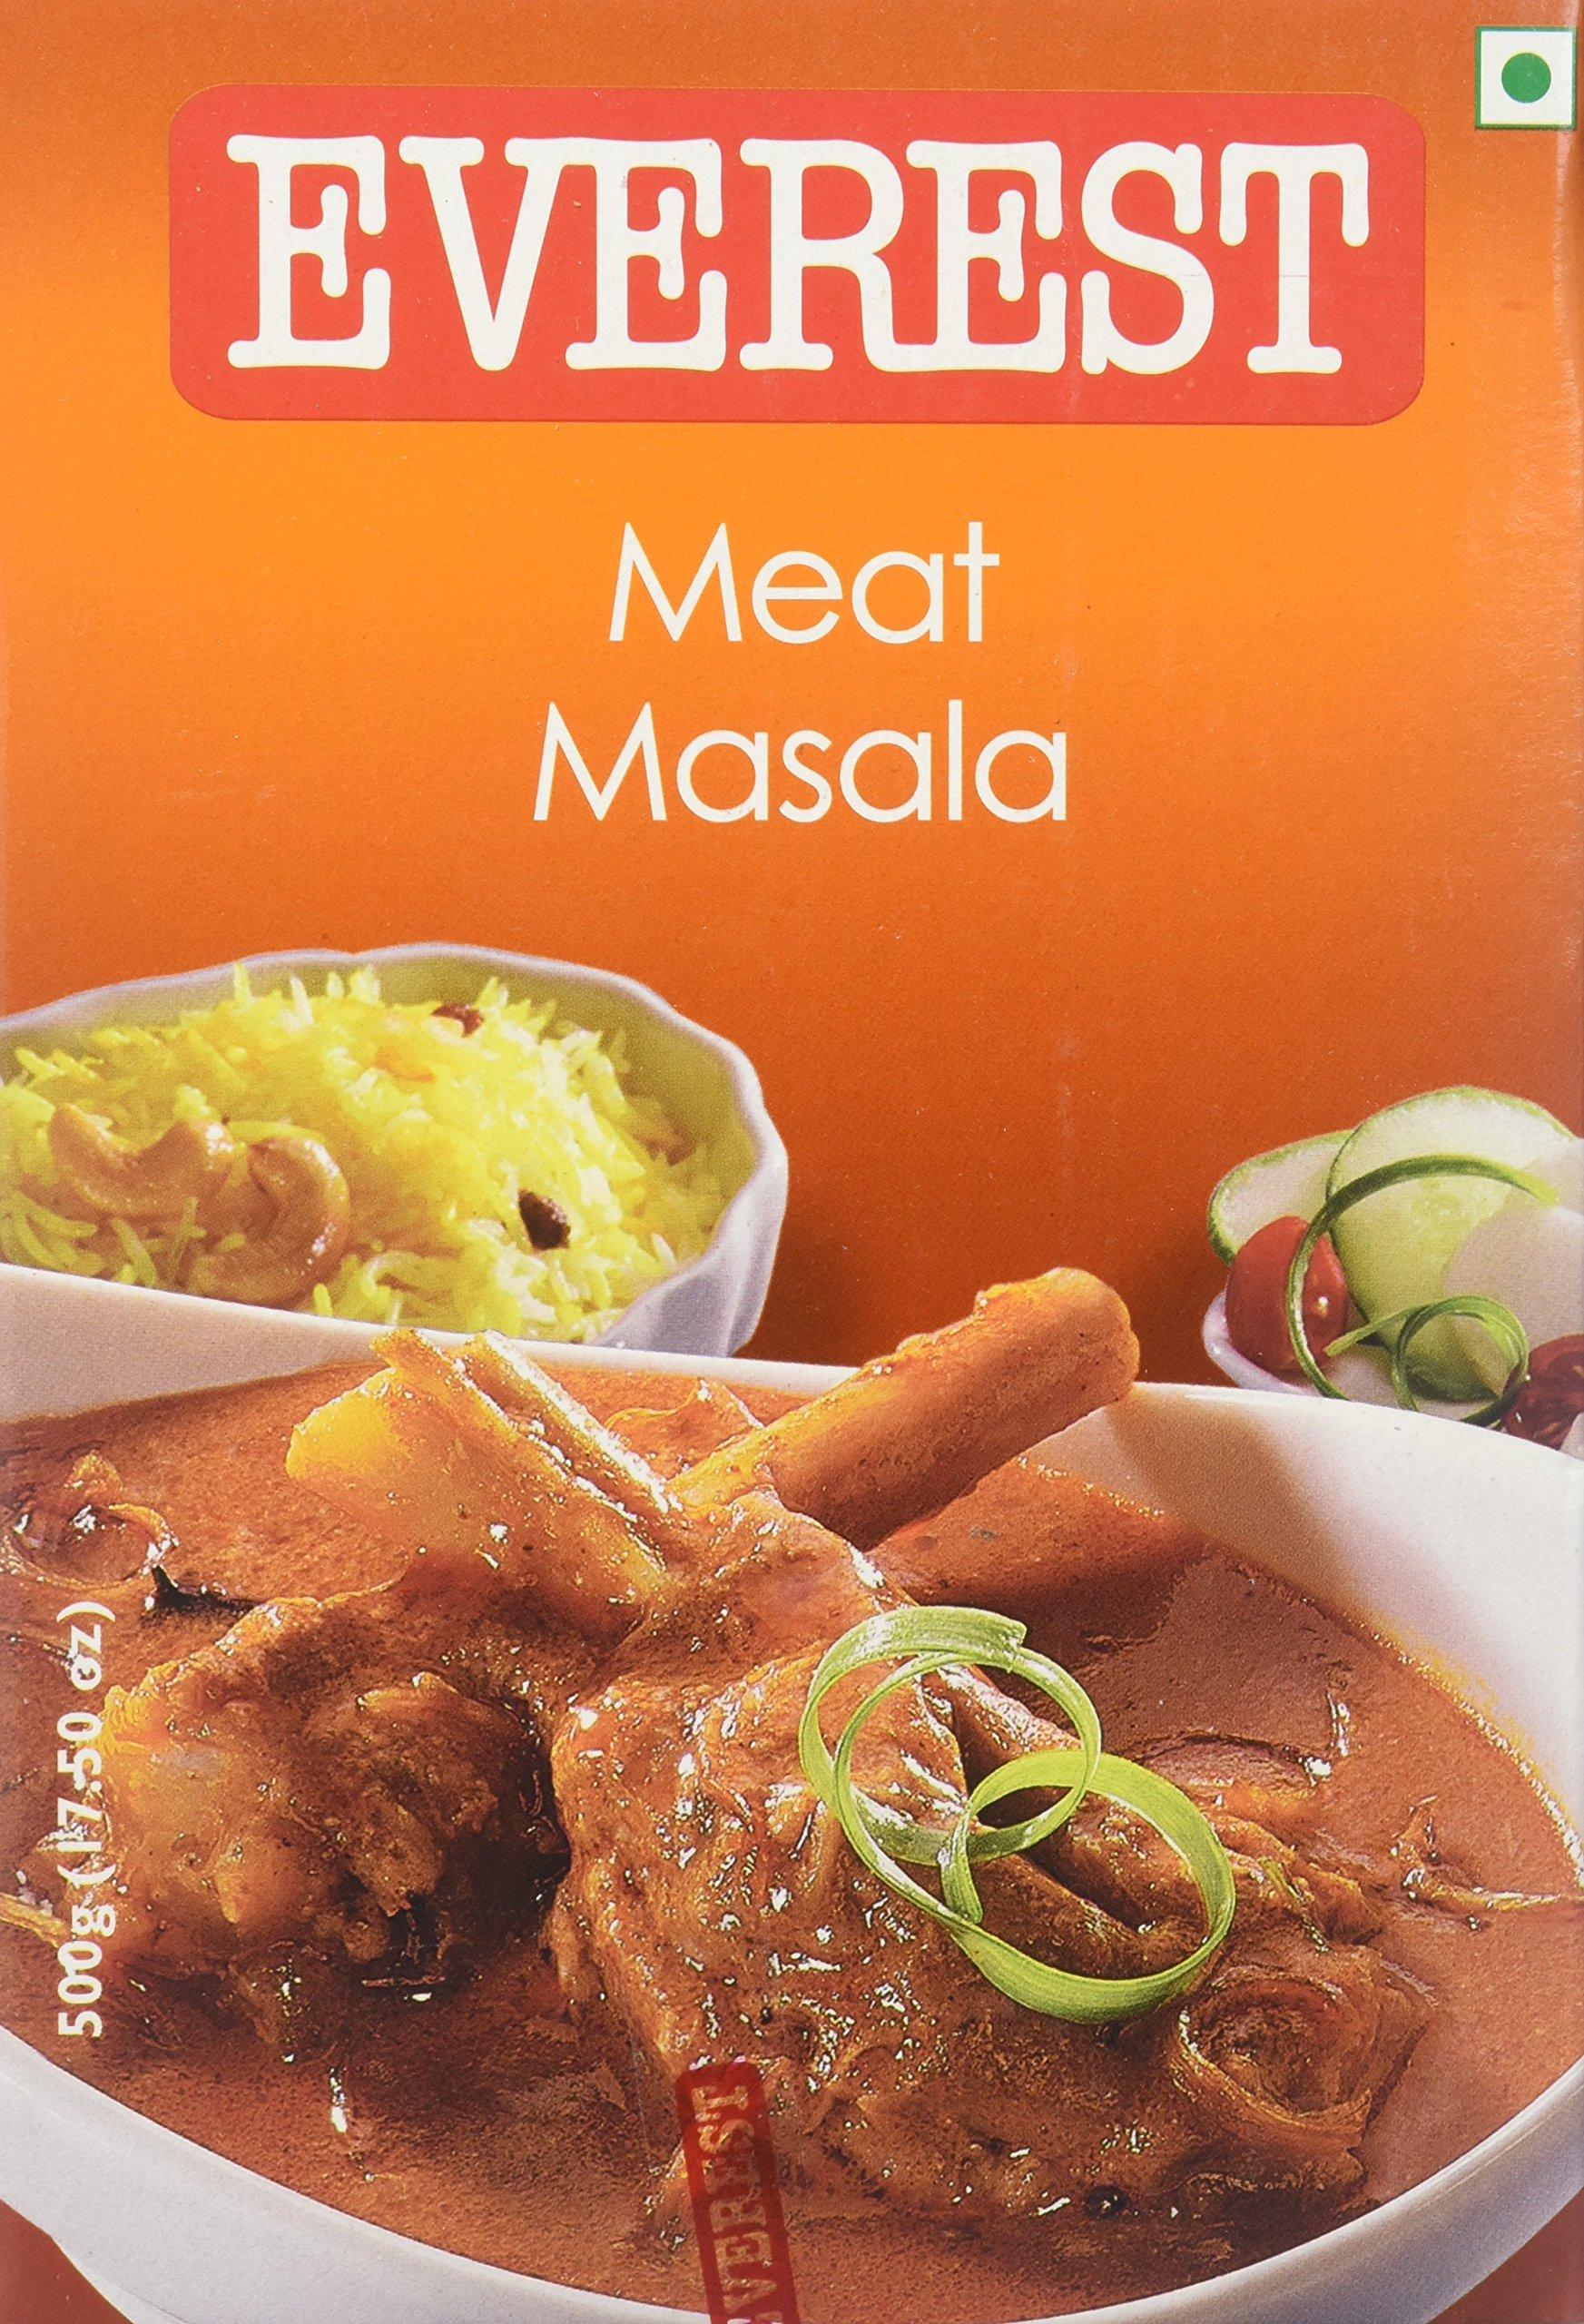 Everest, Meat Masala, 500 Grams(gm)